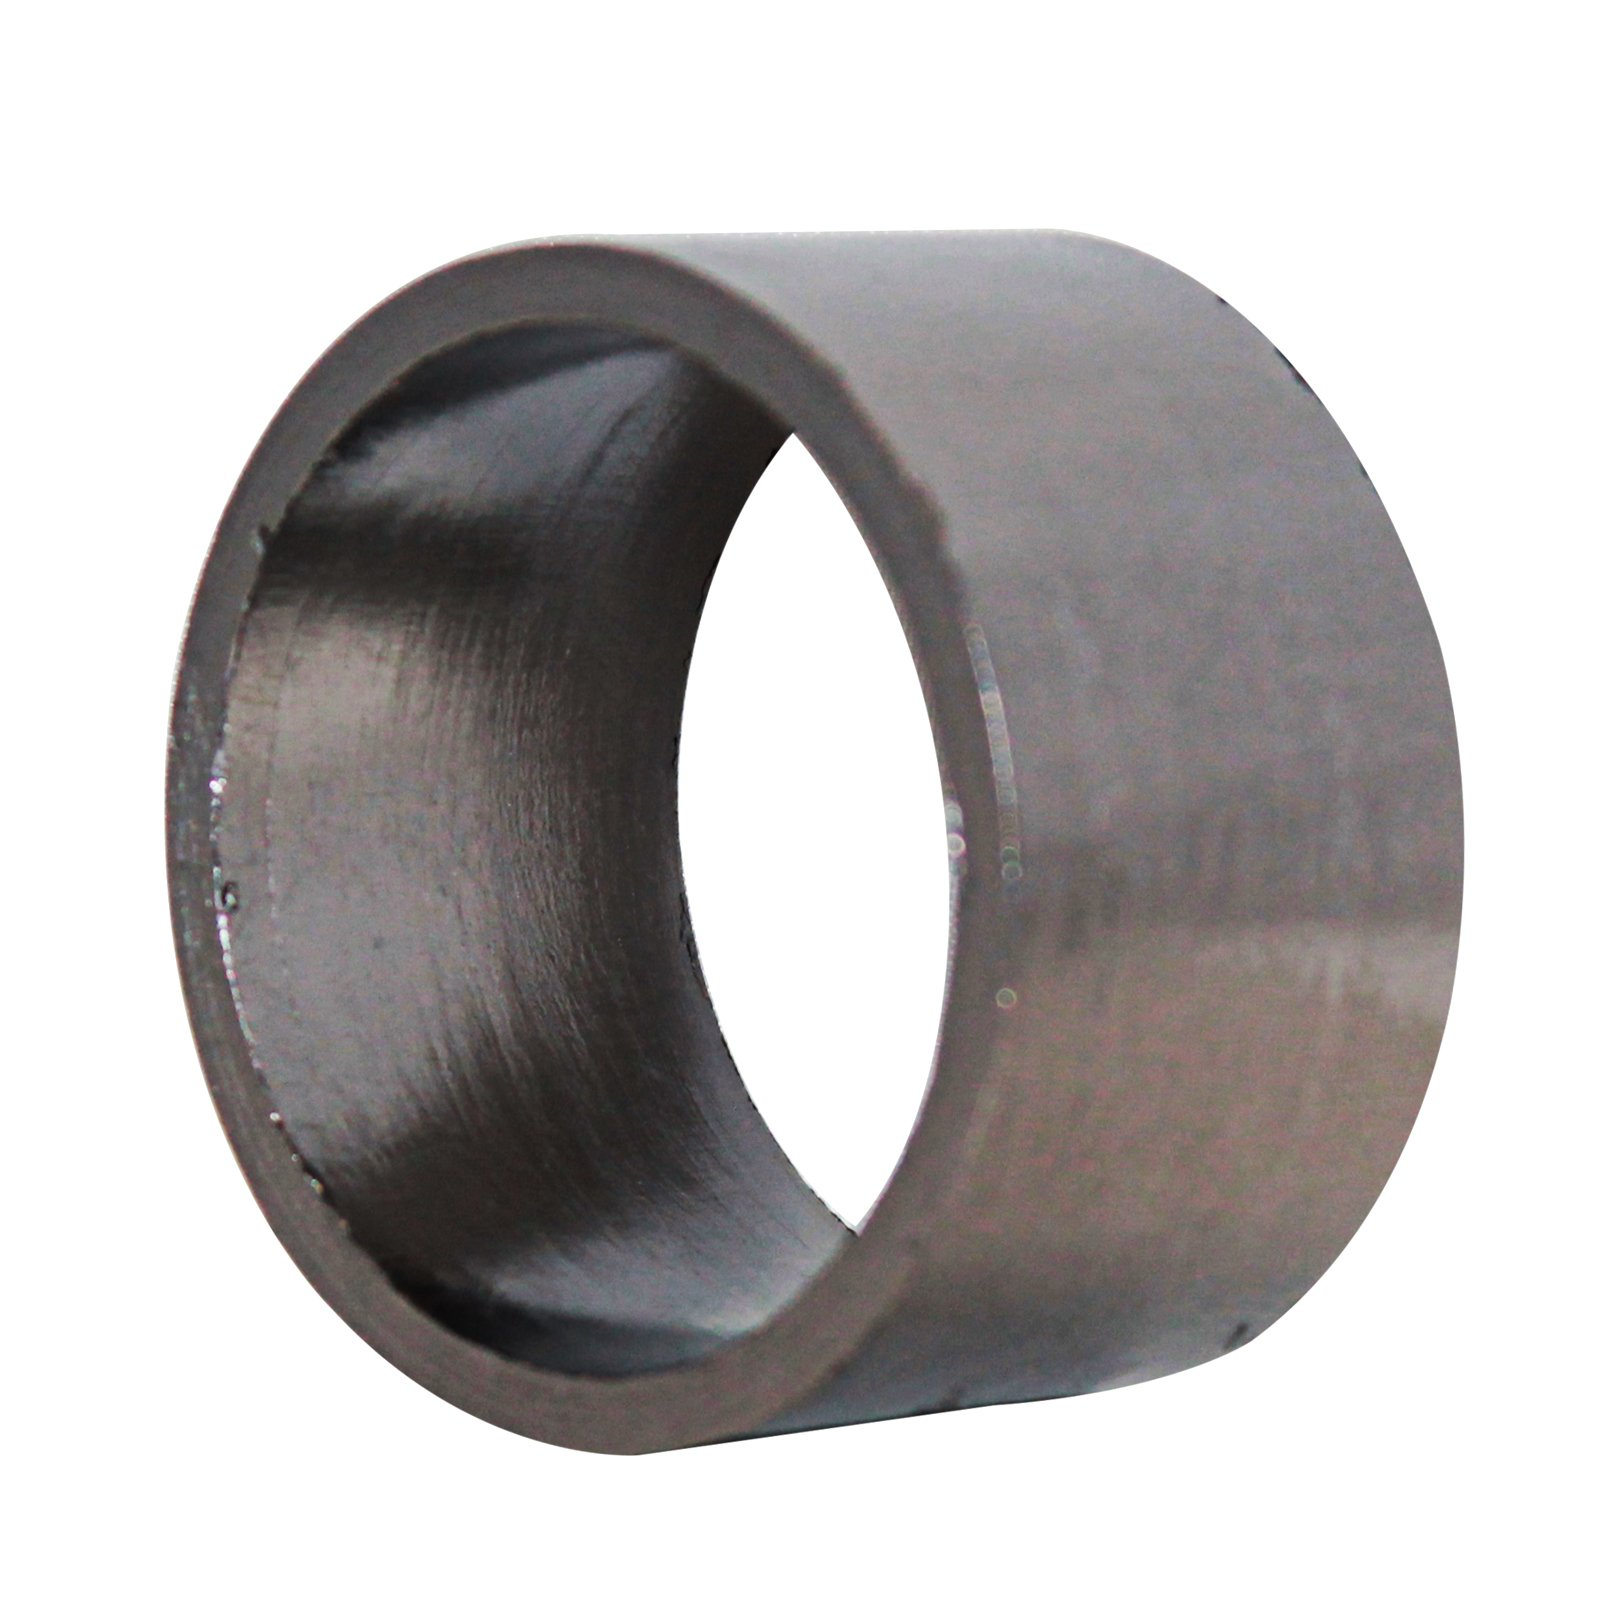 CALTRIC Exhaust Muffler Gasket Fits HONDA 18392-MK4-000, 18391-383-670, 18391-317-010